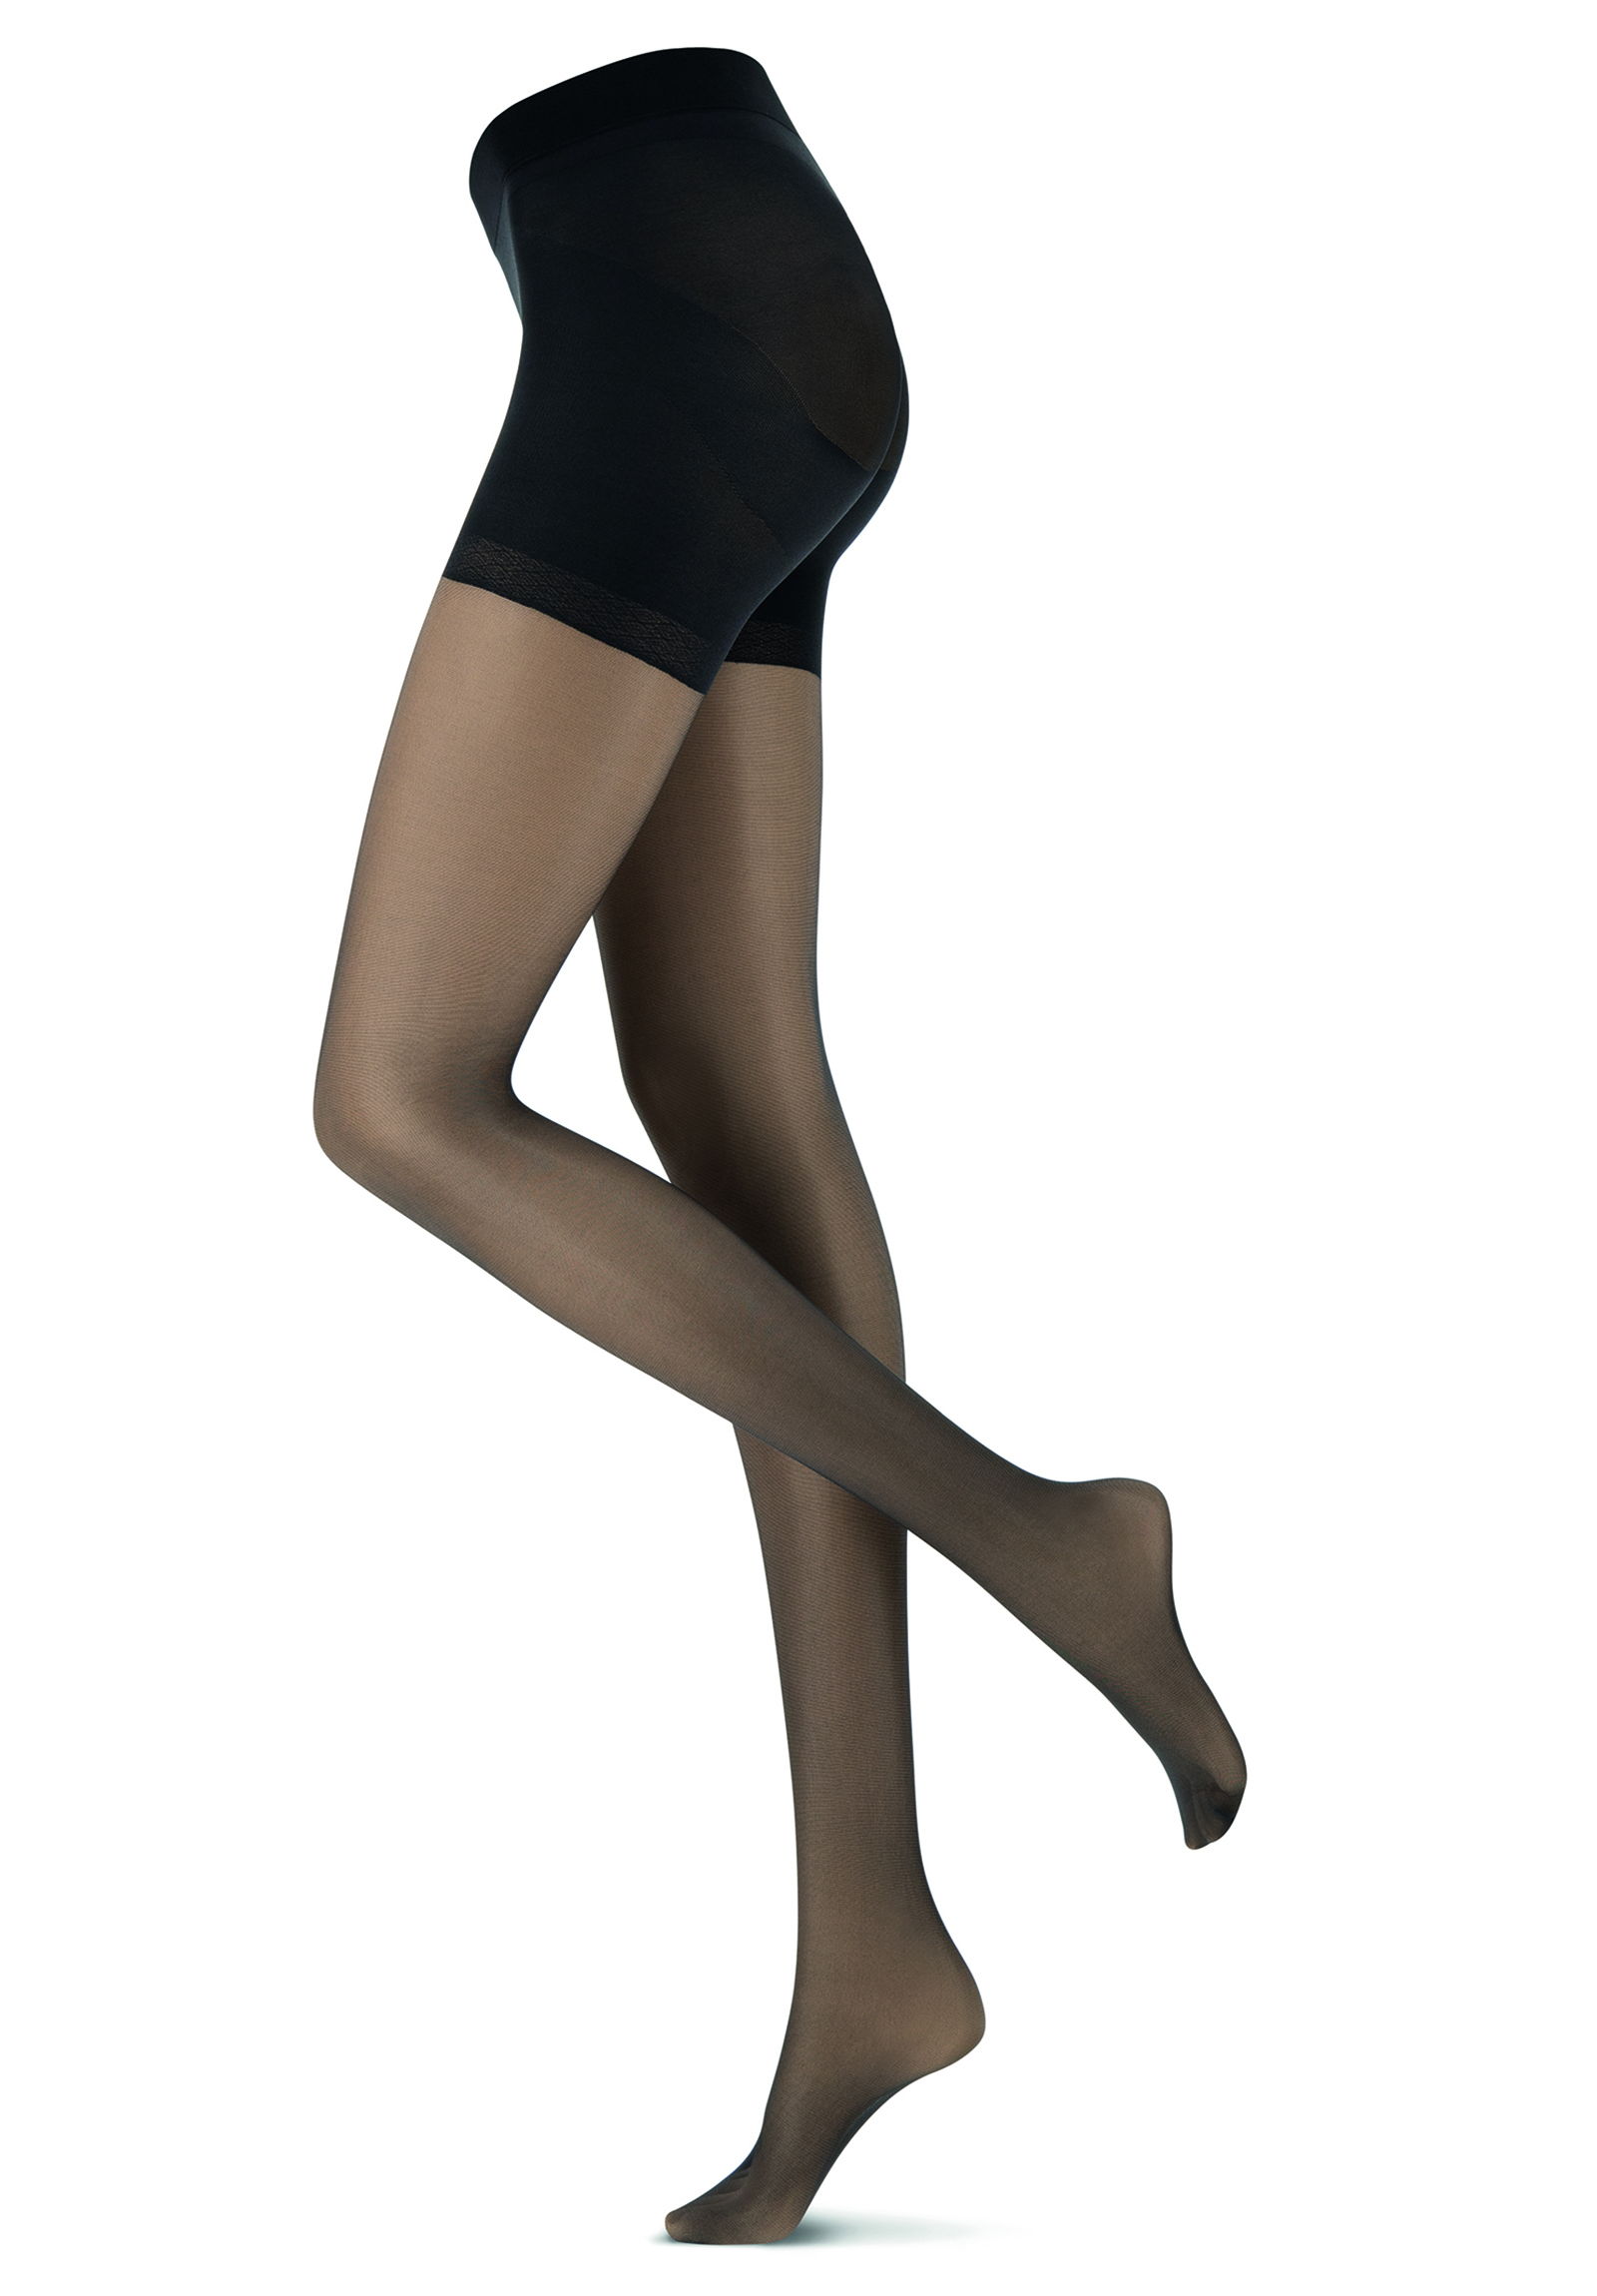 Oroblu Shock Up Light 20 tights, black, large